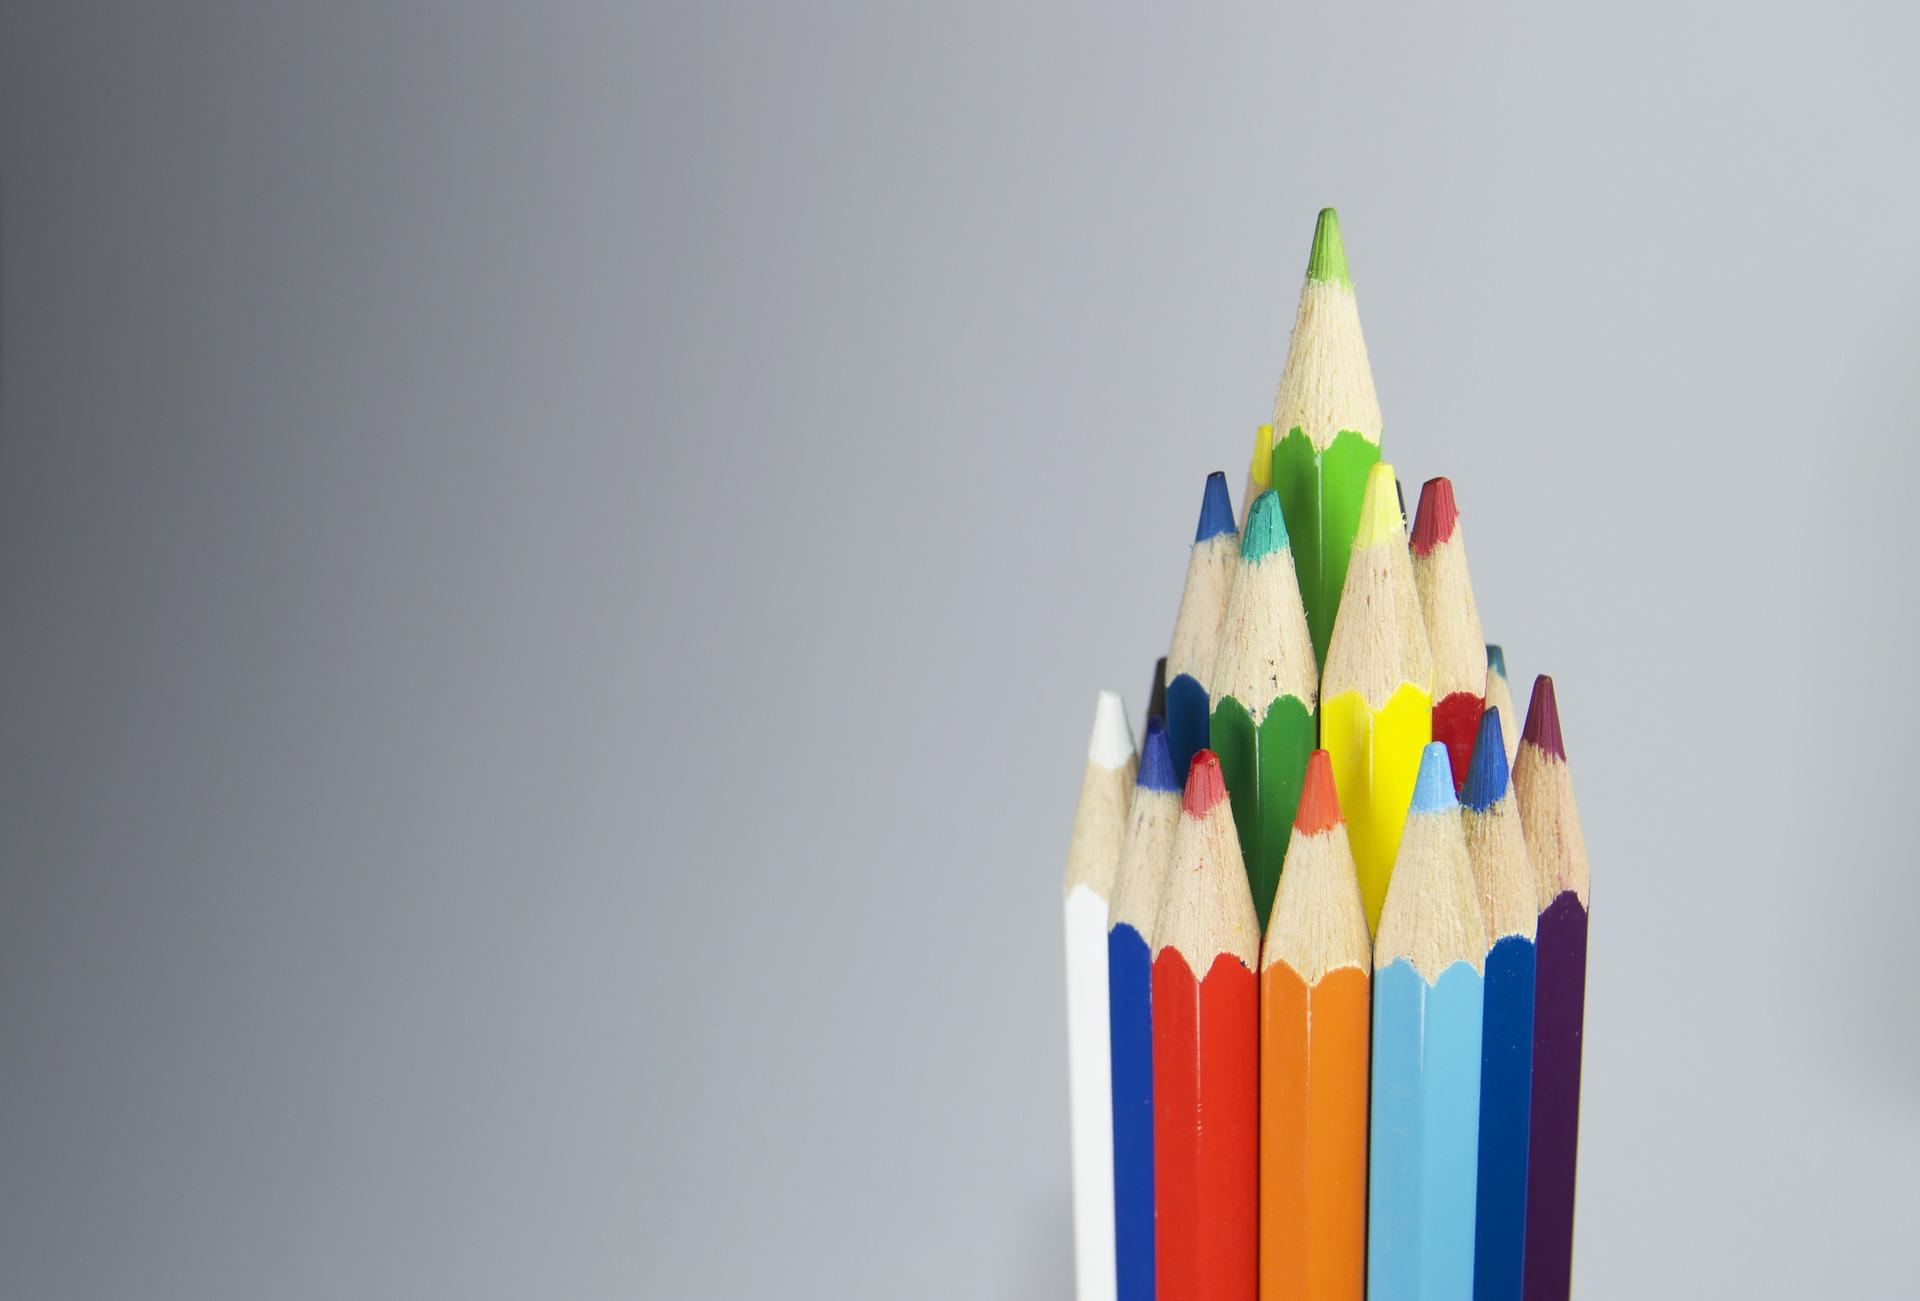 карандаши, Вуд, цвета, Пирамида, параболических - Обои HD - Профессор falken.com